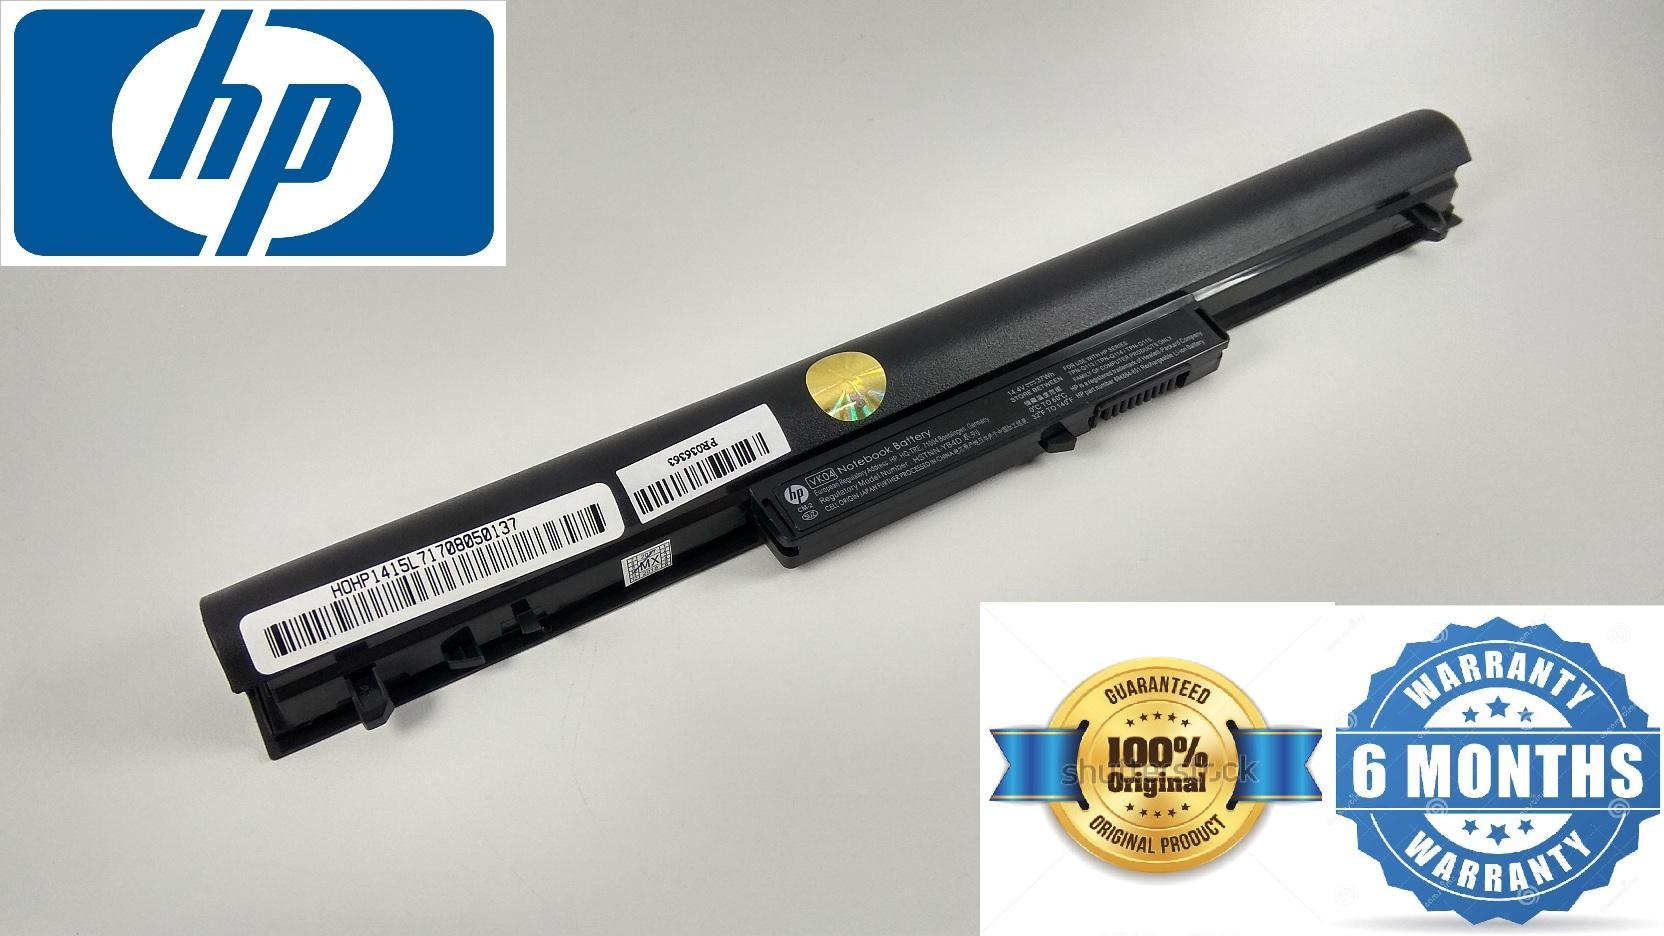 Hp Original Baterai Laptop Pavilion VK04 ,14 14t 14z, 15 15t 15z Series/ HP Pavilion Sleekbook 14 14t 14z, 15 15t 15z Series/ 694864-851, HSTNN-DB4D, HSTNN-YB4D, HSTNN-YB4M ORI